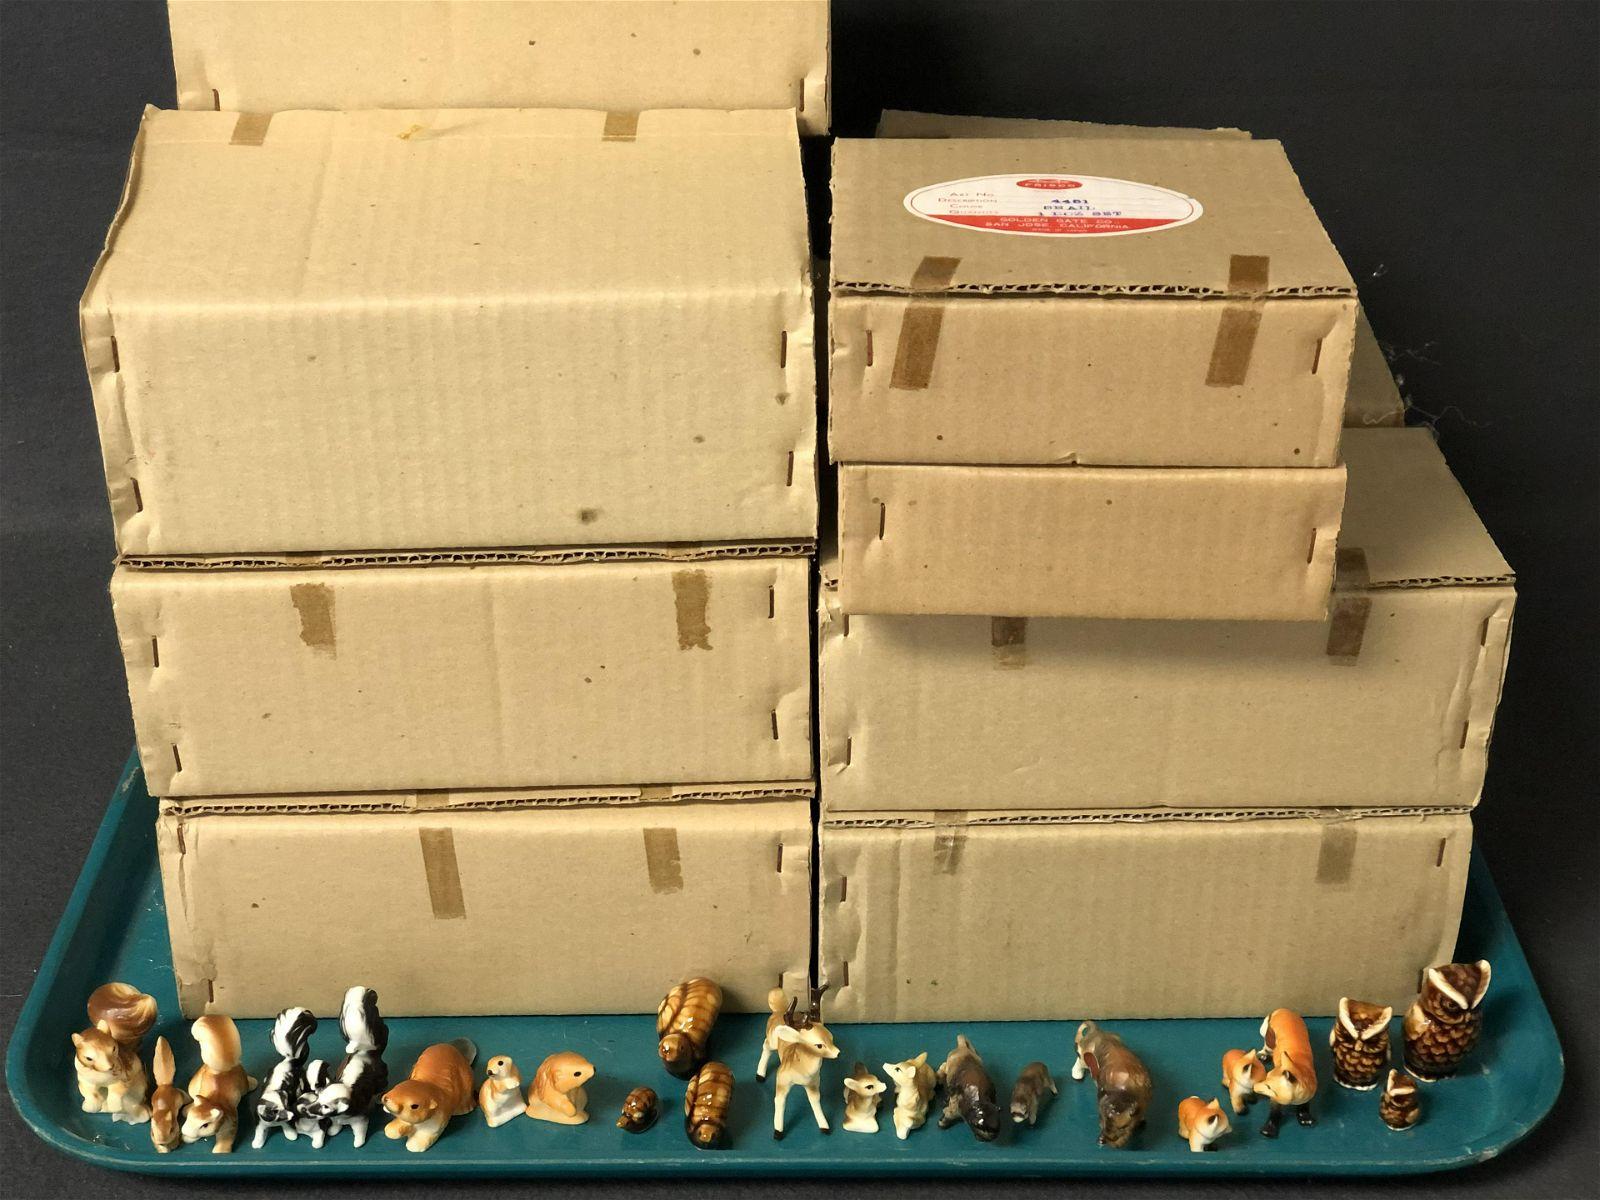 180 Boxes Golden Gate Frisco Miniatures - Vtg New Old